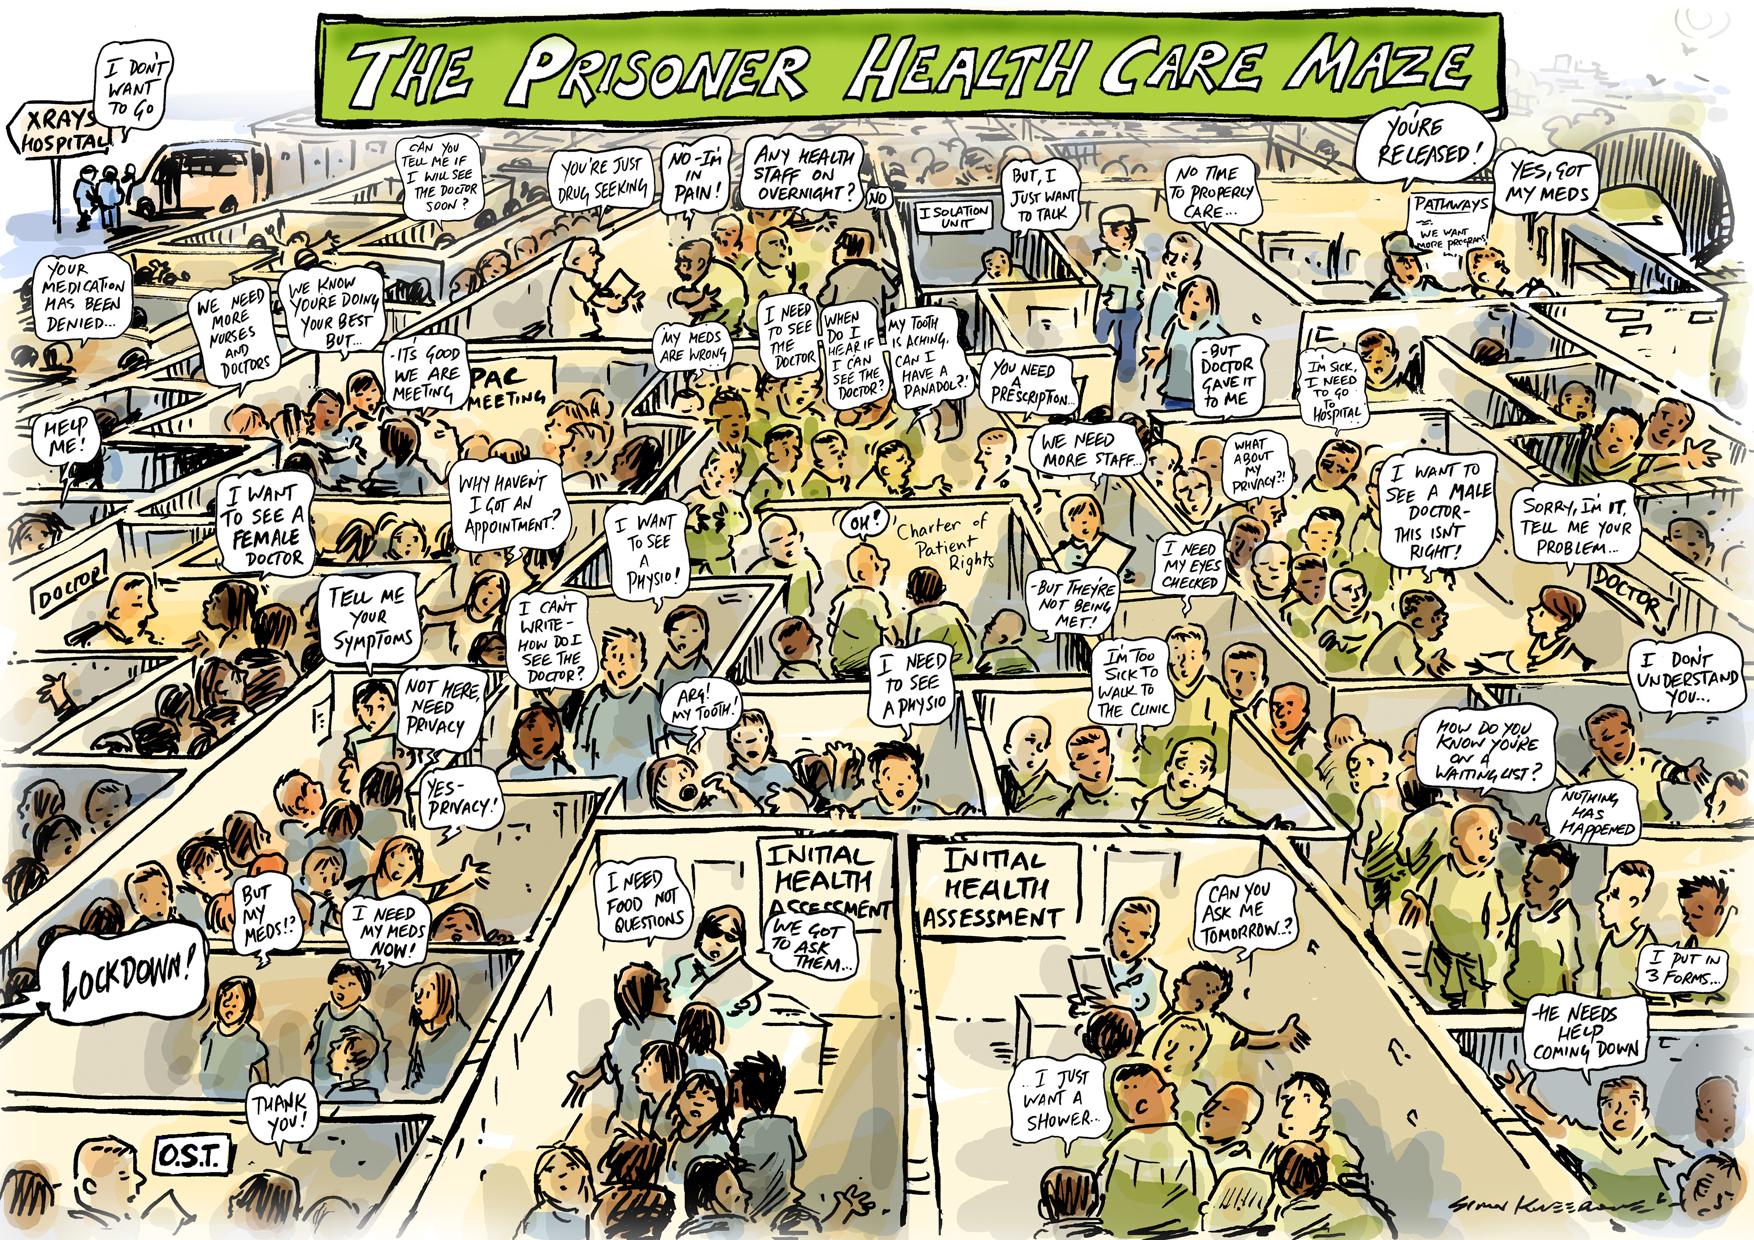 Prisoner Health Care Maze LR pic.jpg